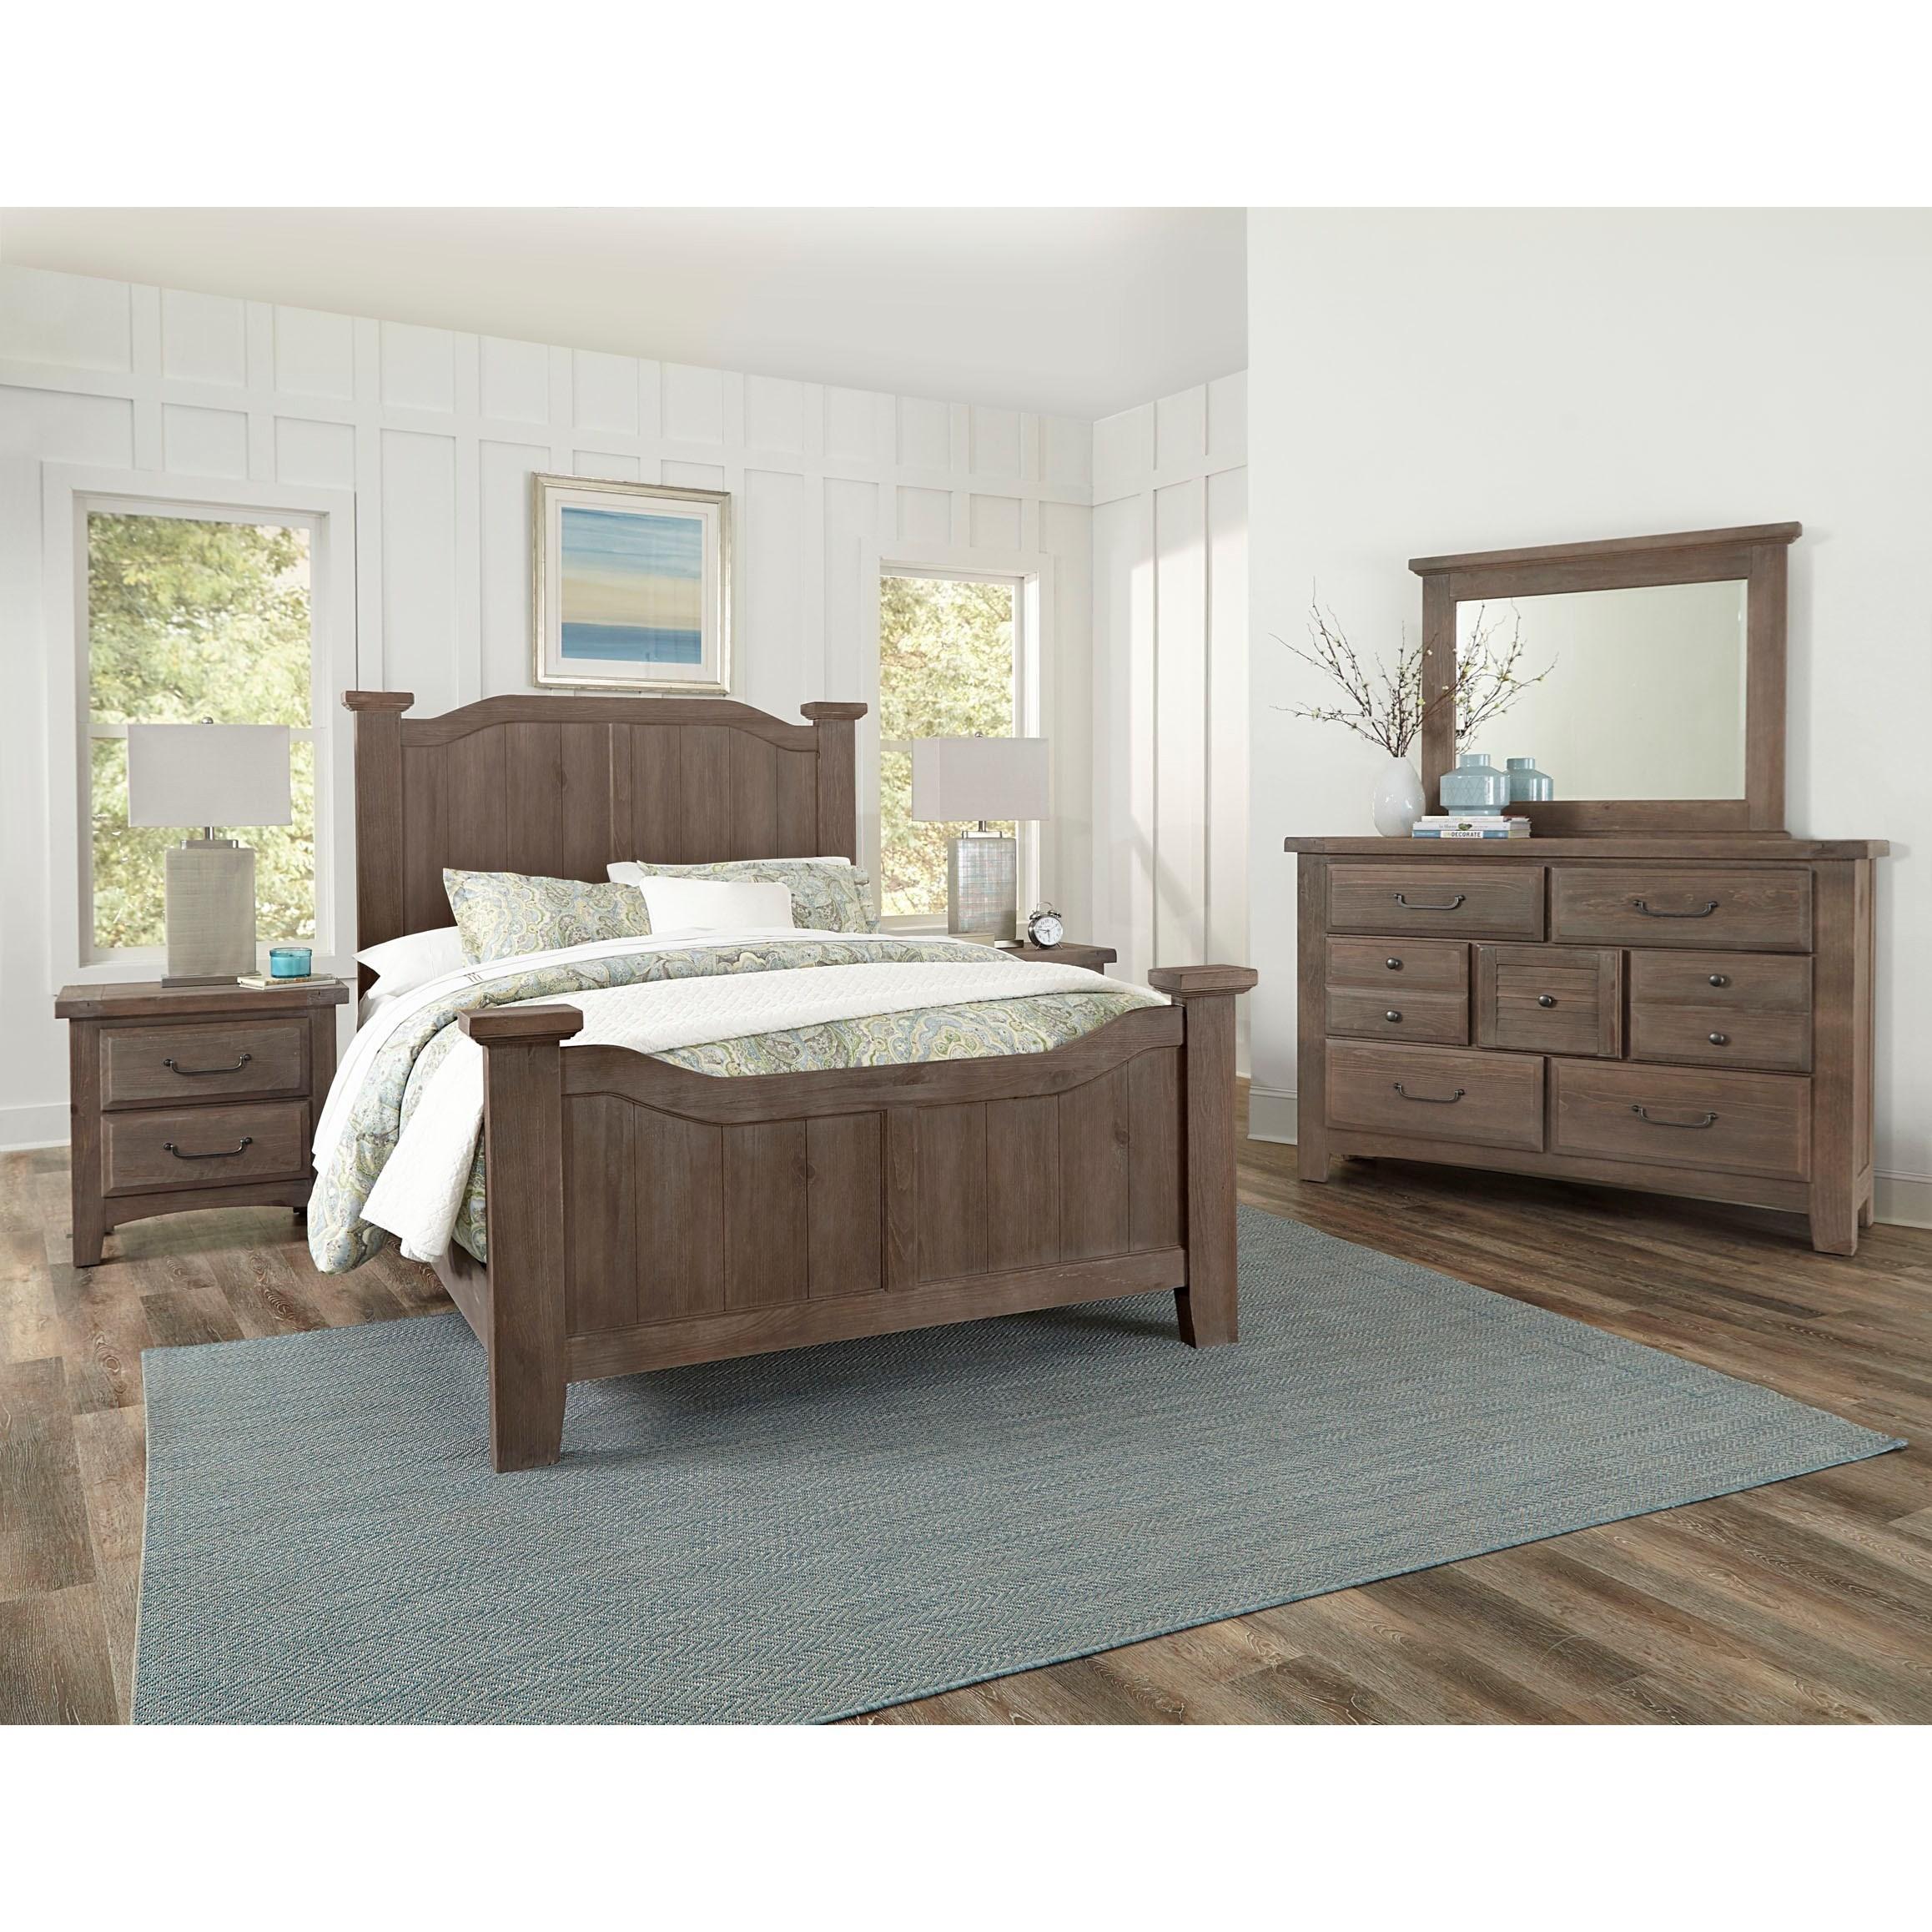 Sawmill King Bedroom Group by Vaughan Bassett at Mueller Furniture